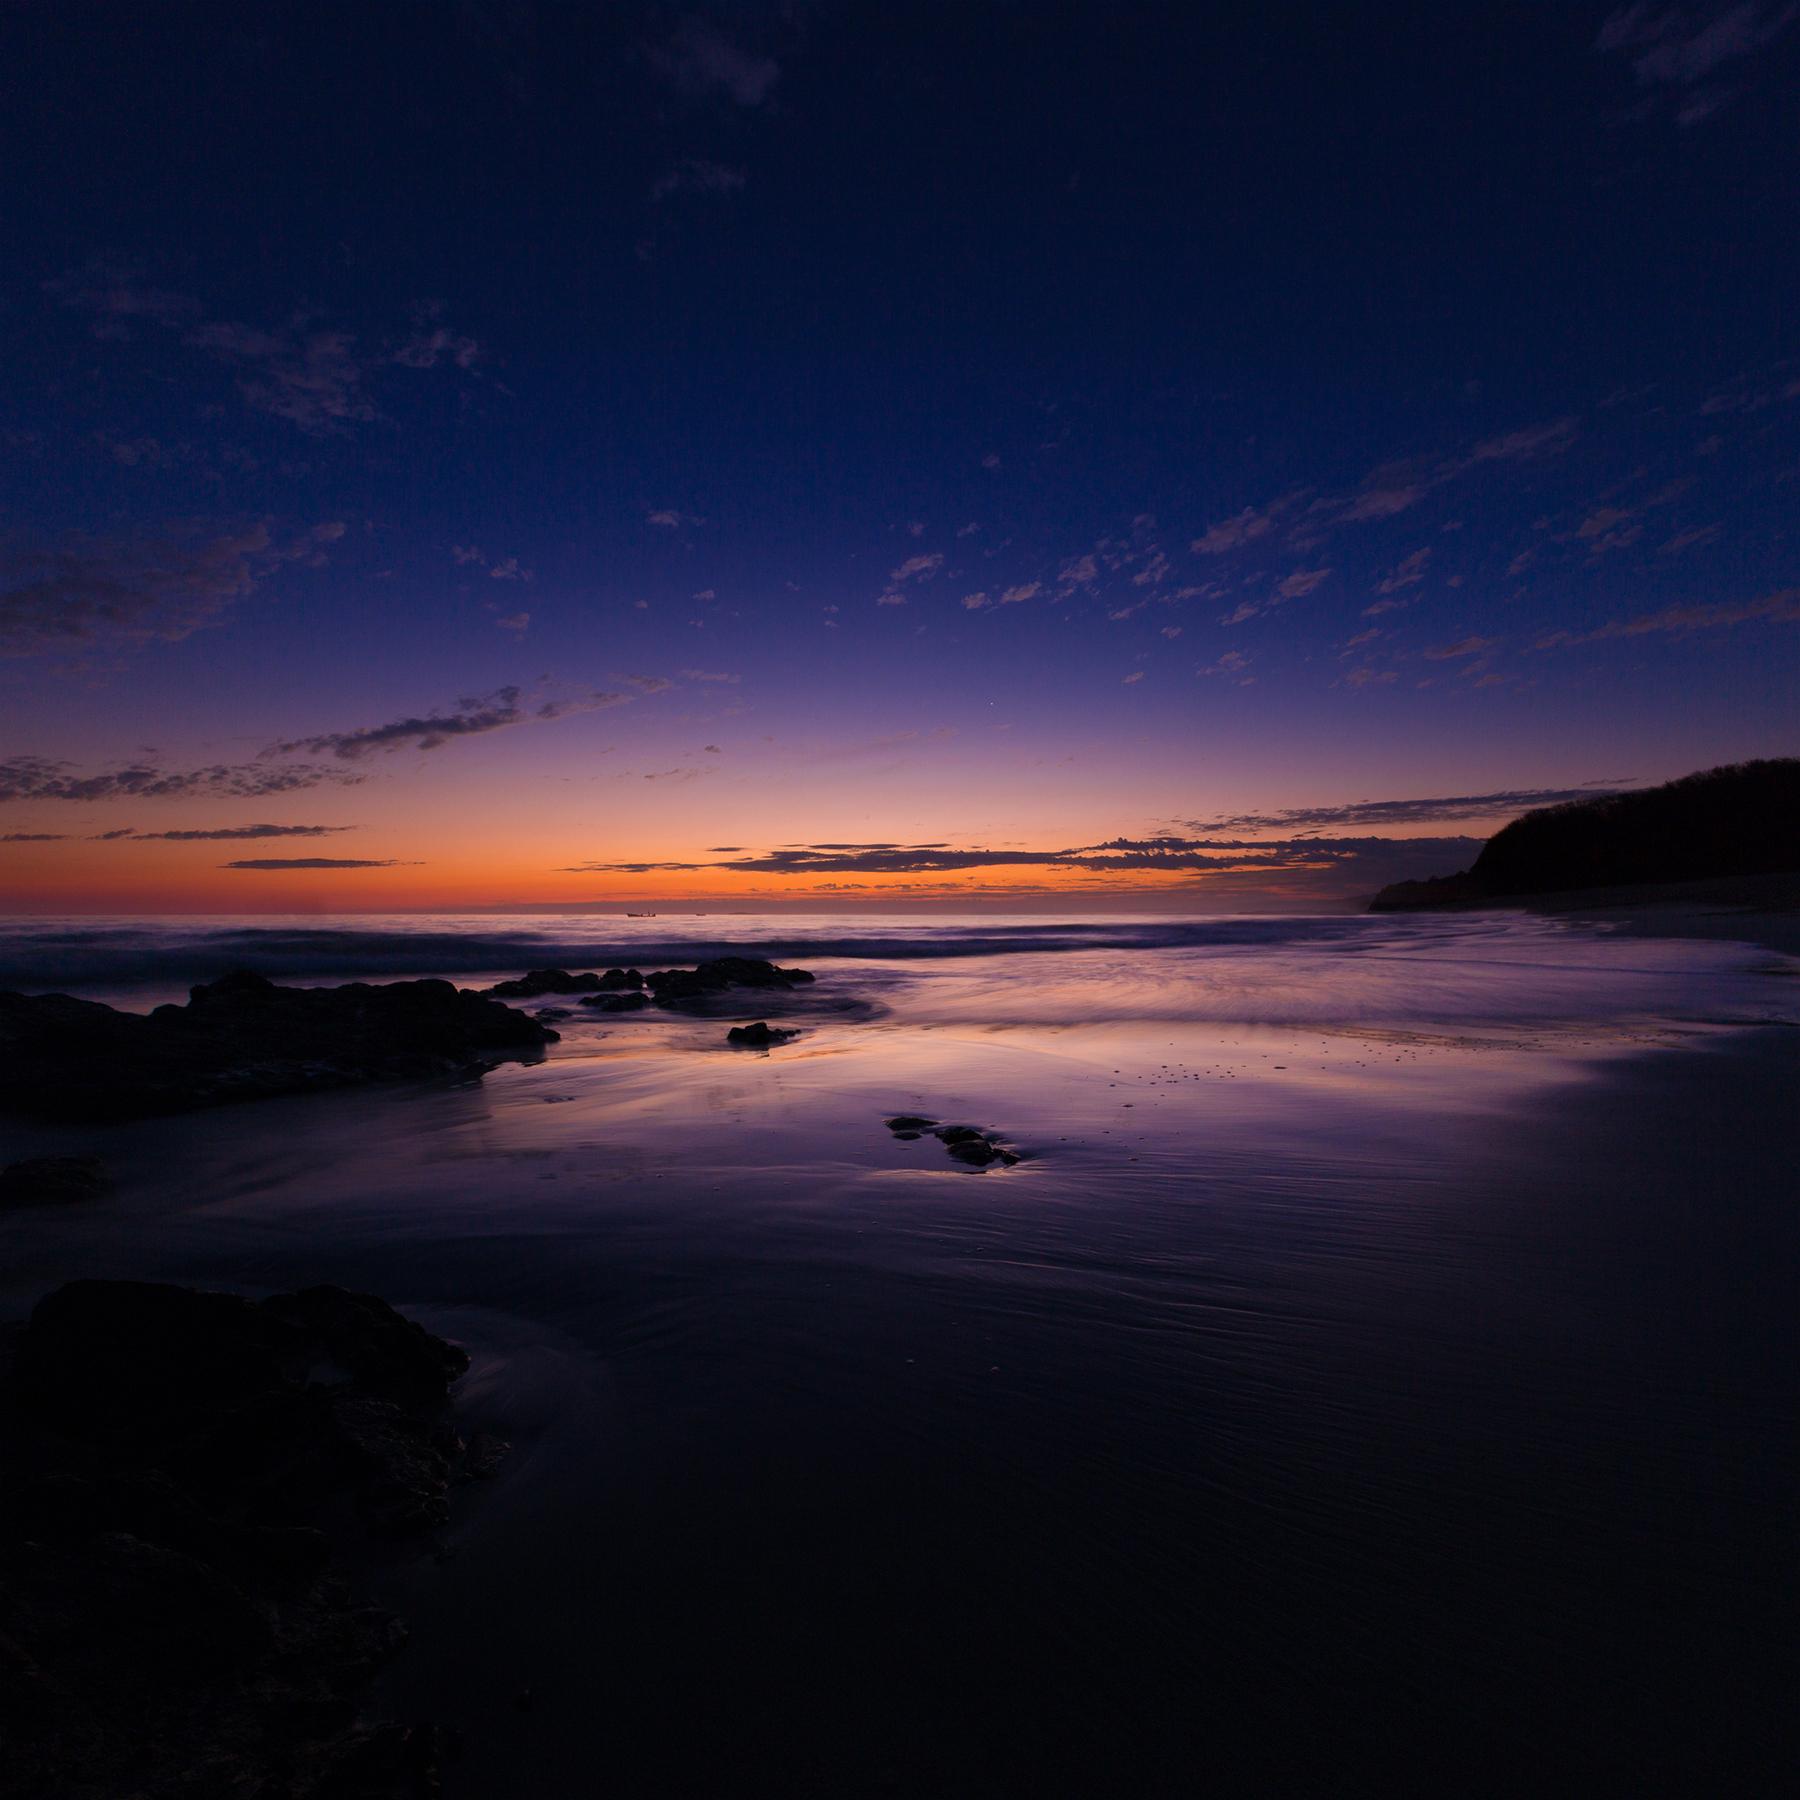 NAUI, Riviera Nayarit